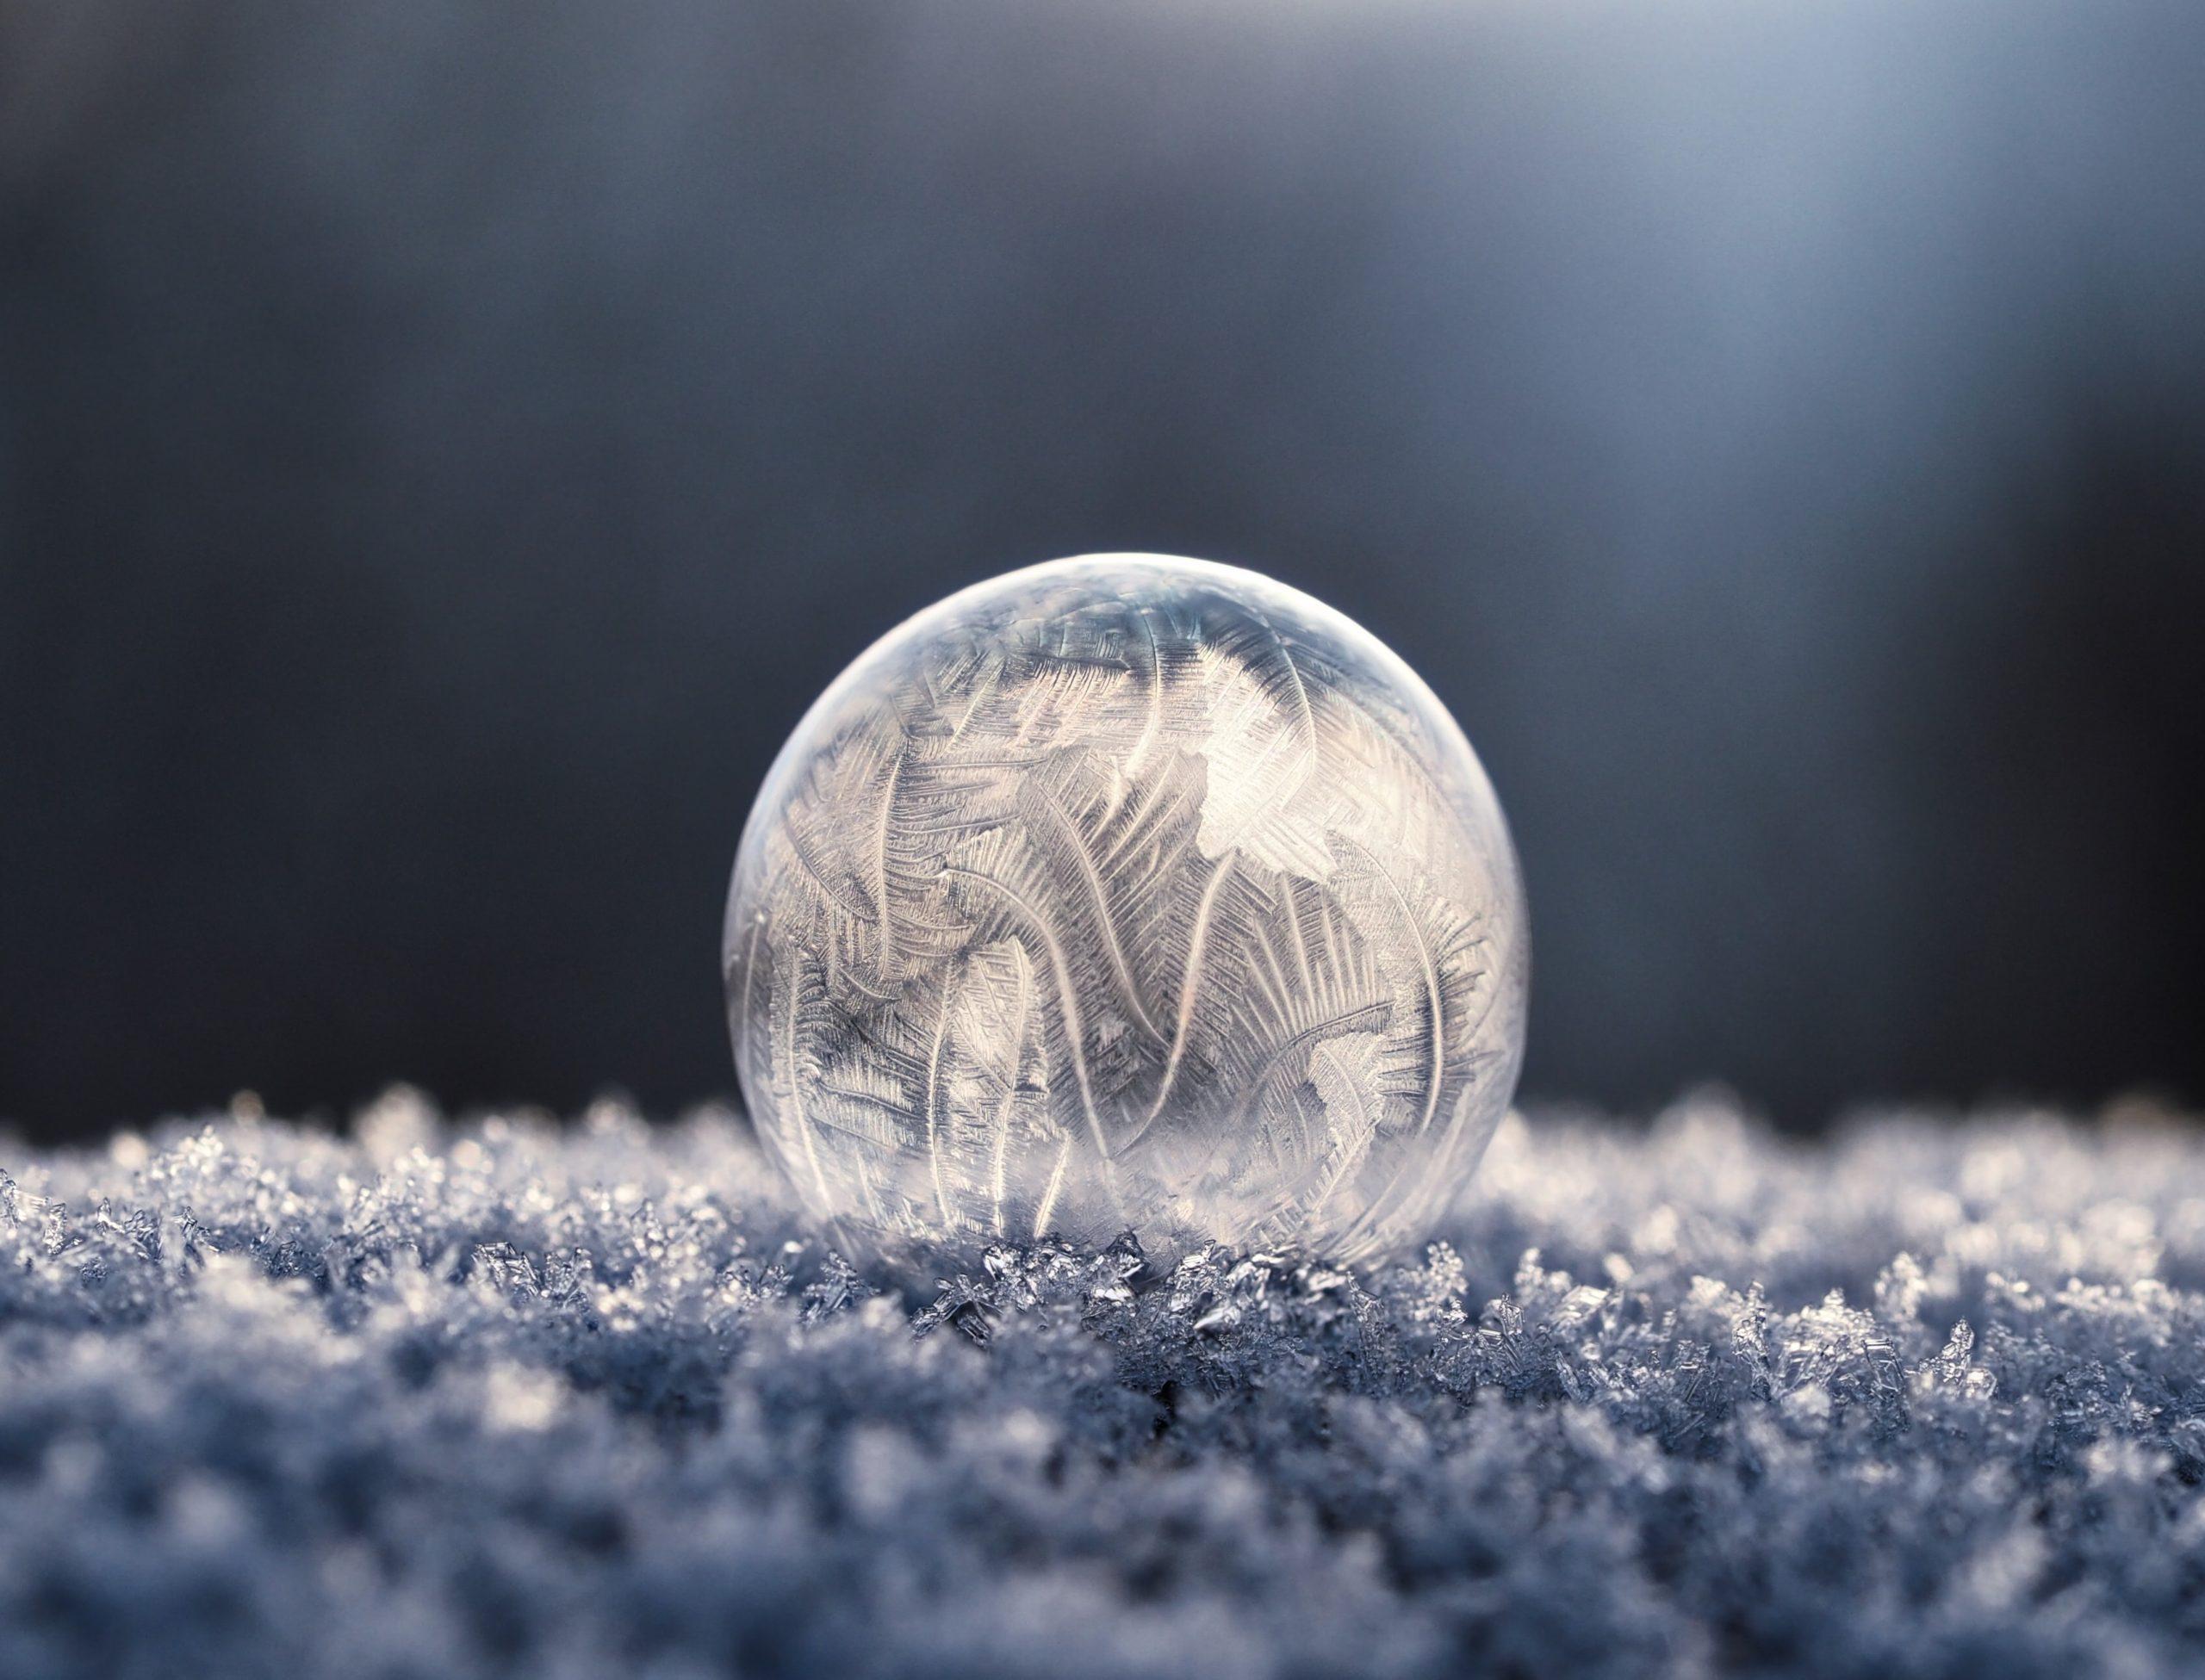 the bubble life